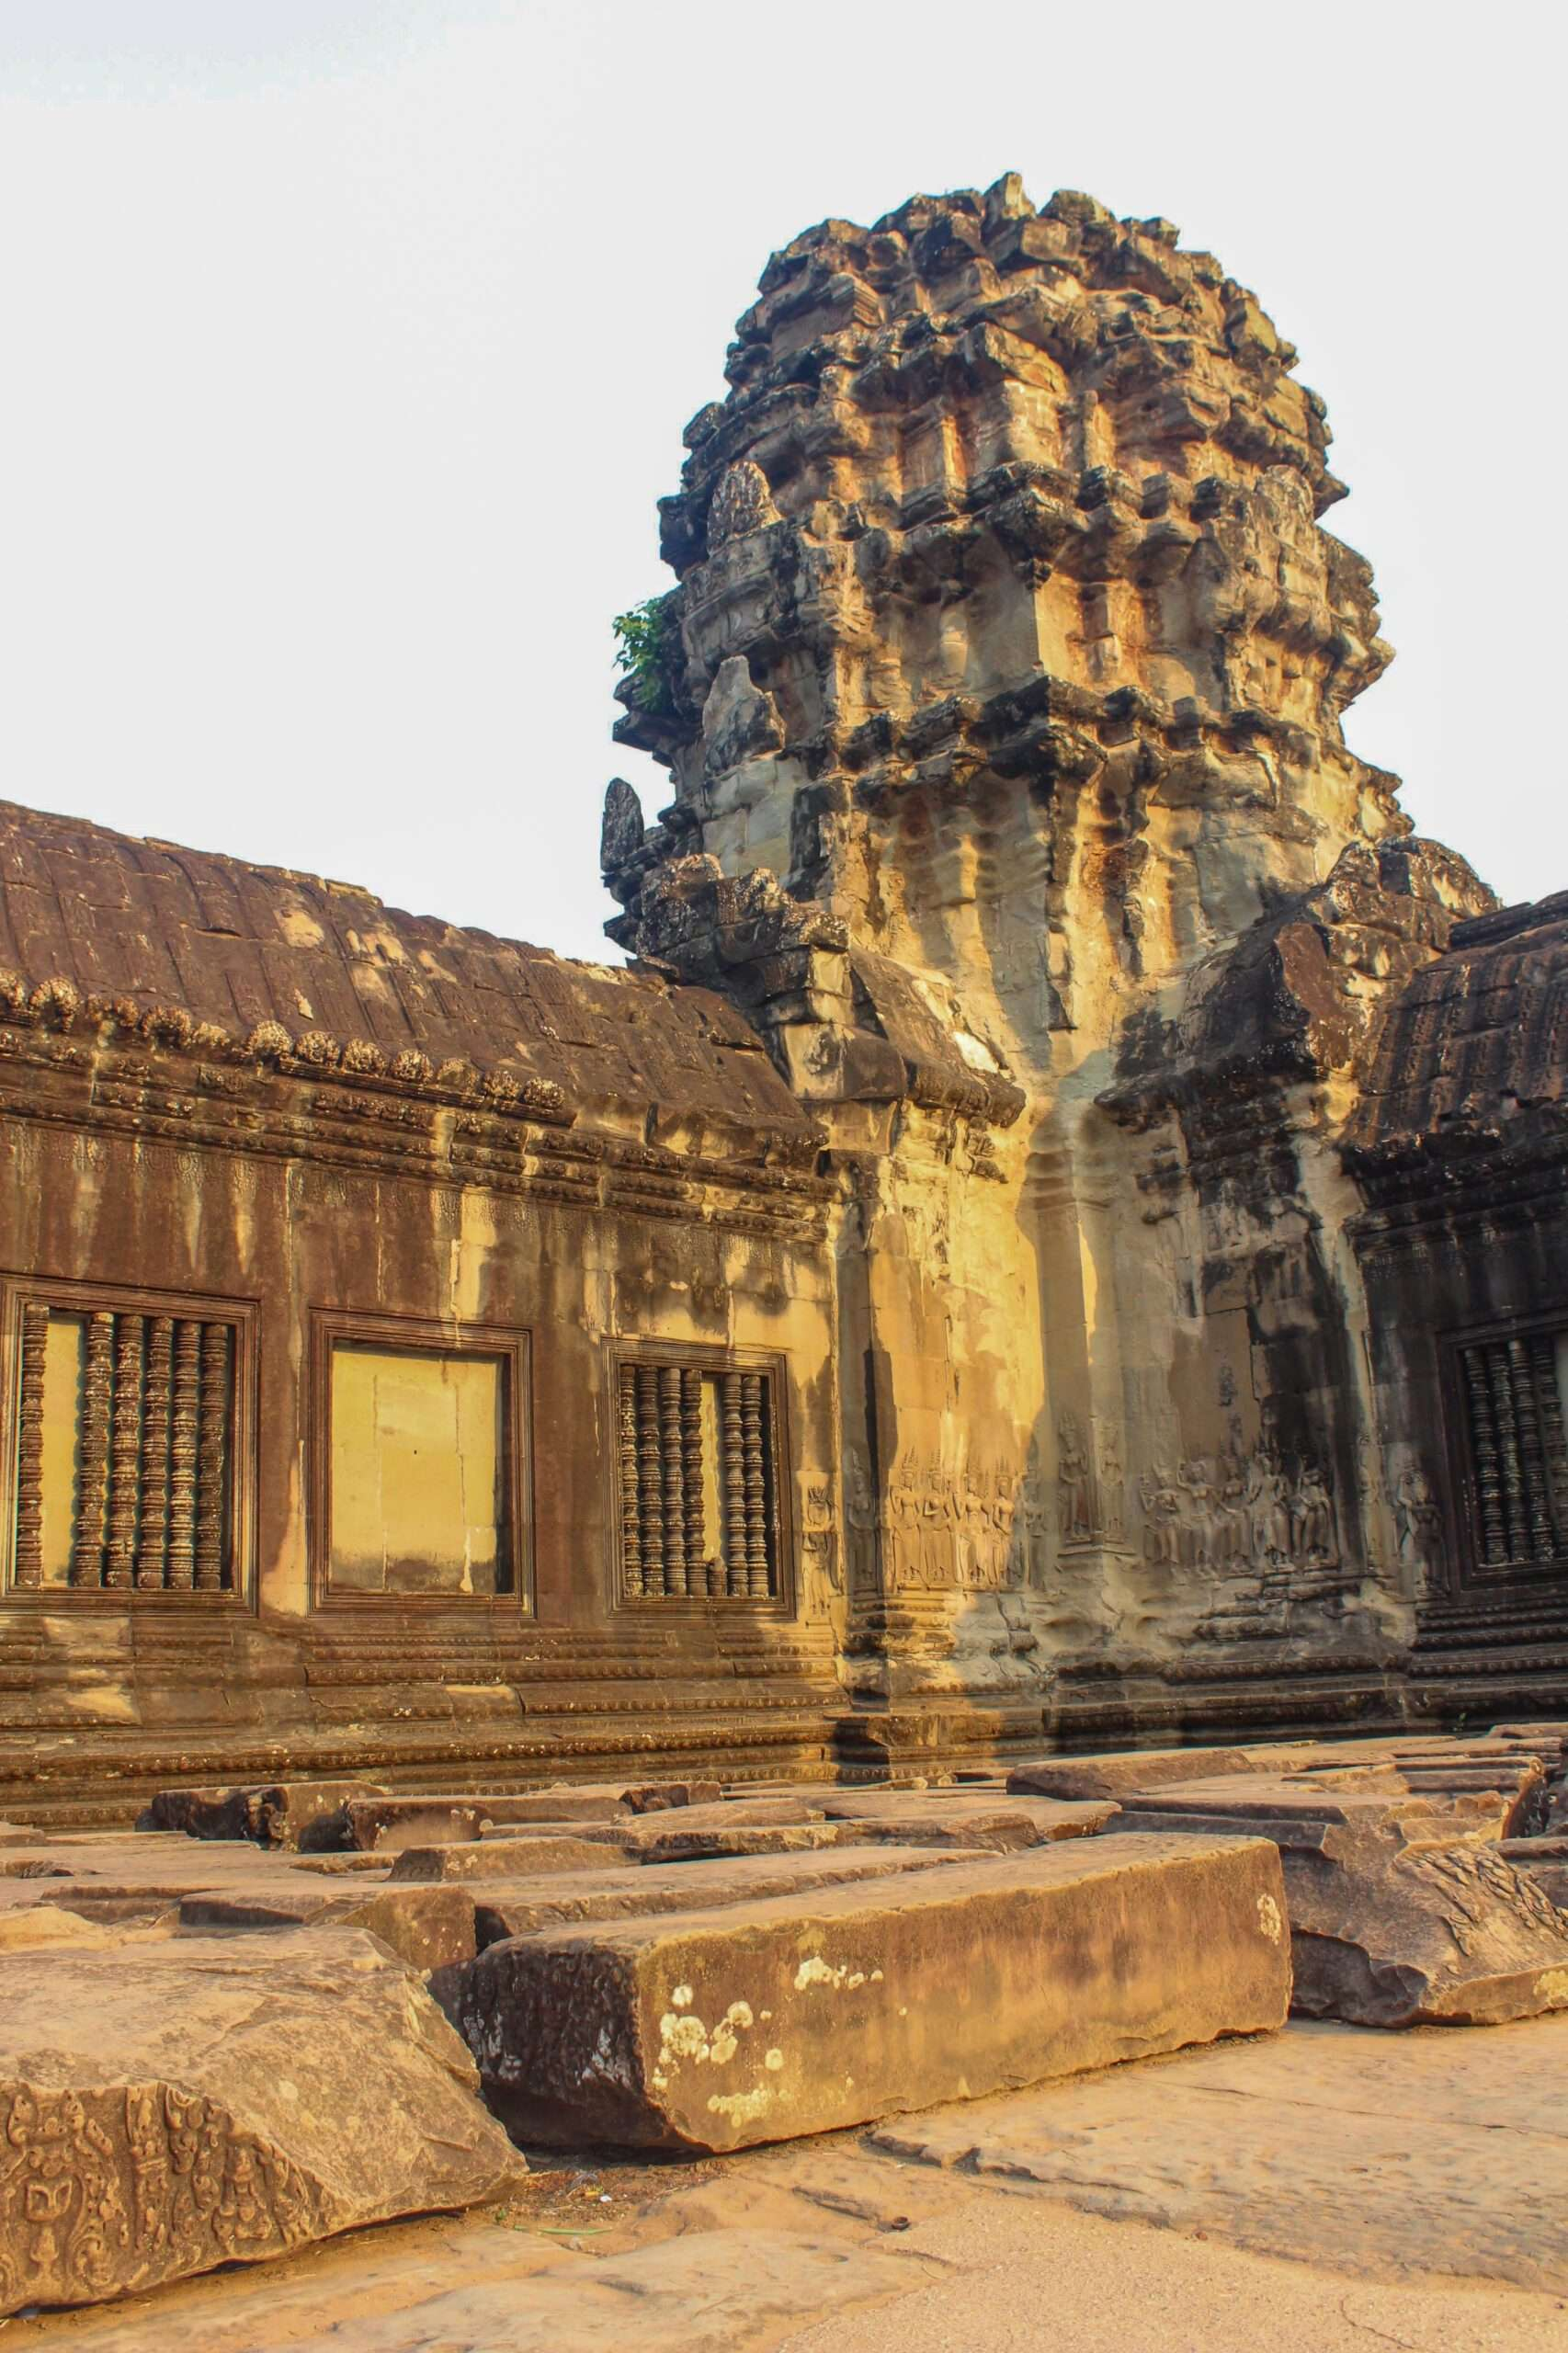 corner of the Angkor Wat temple, seen at sunrise